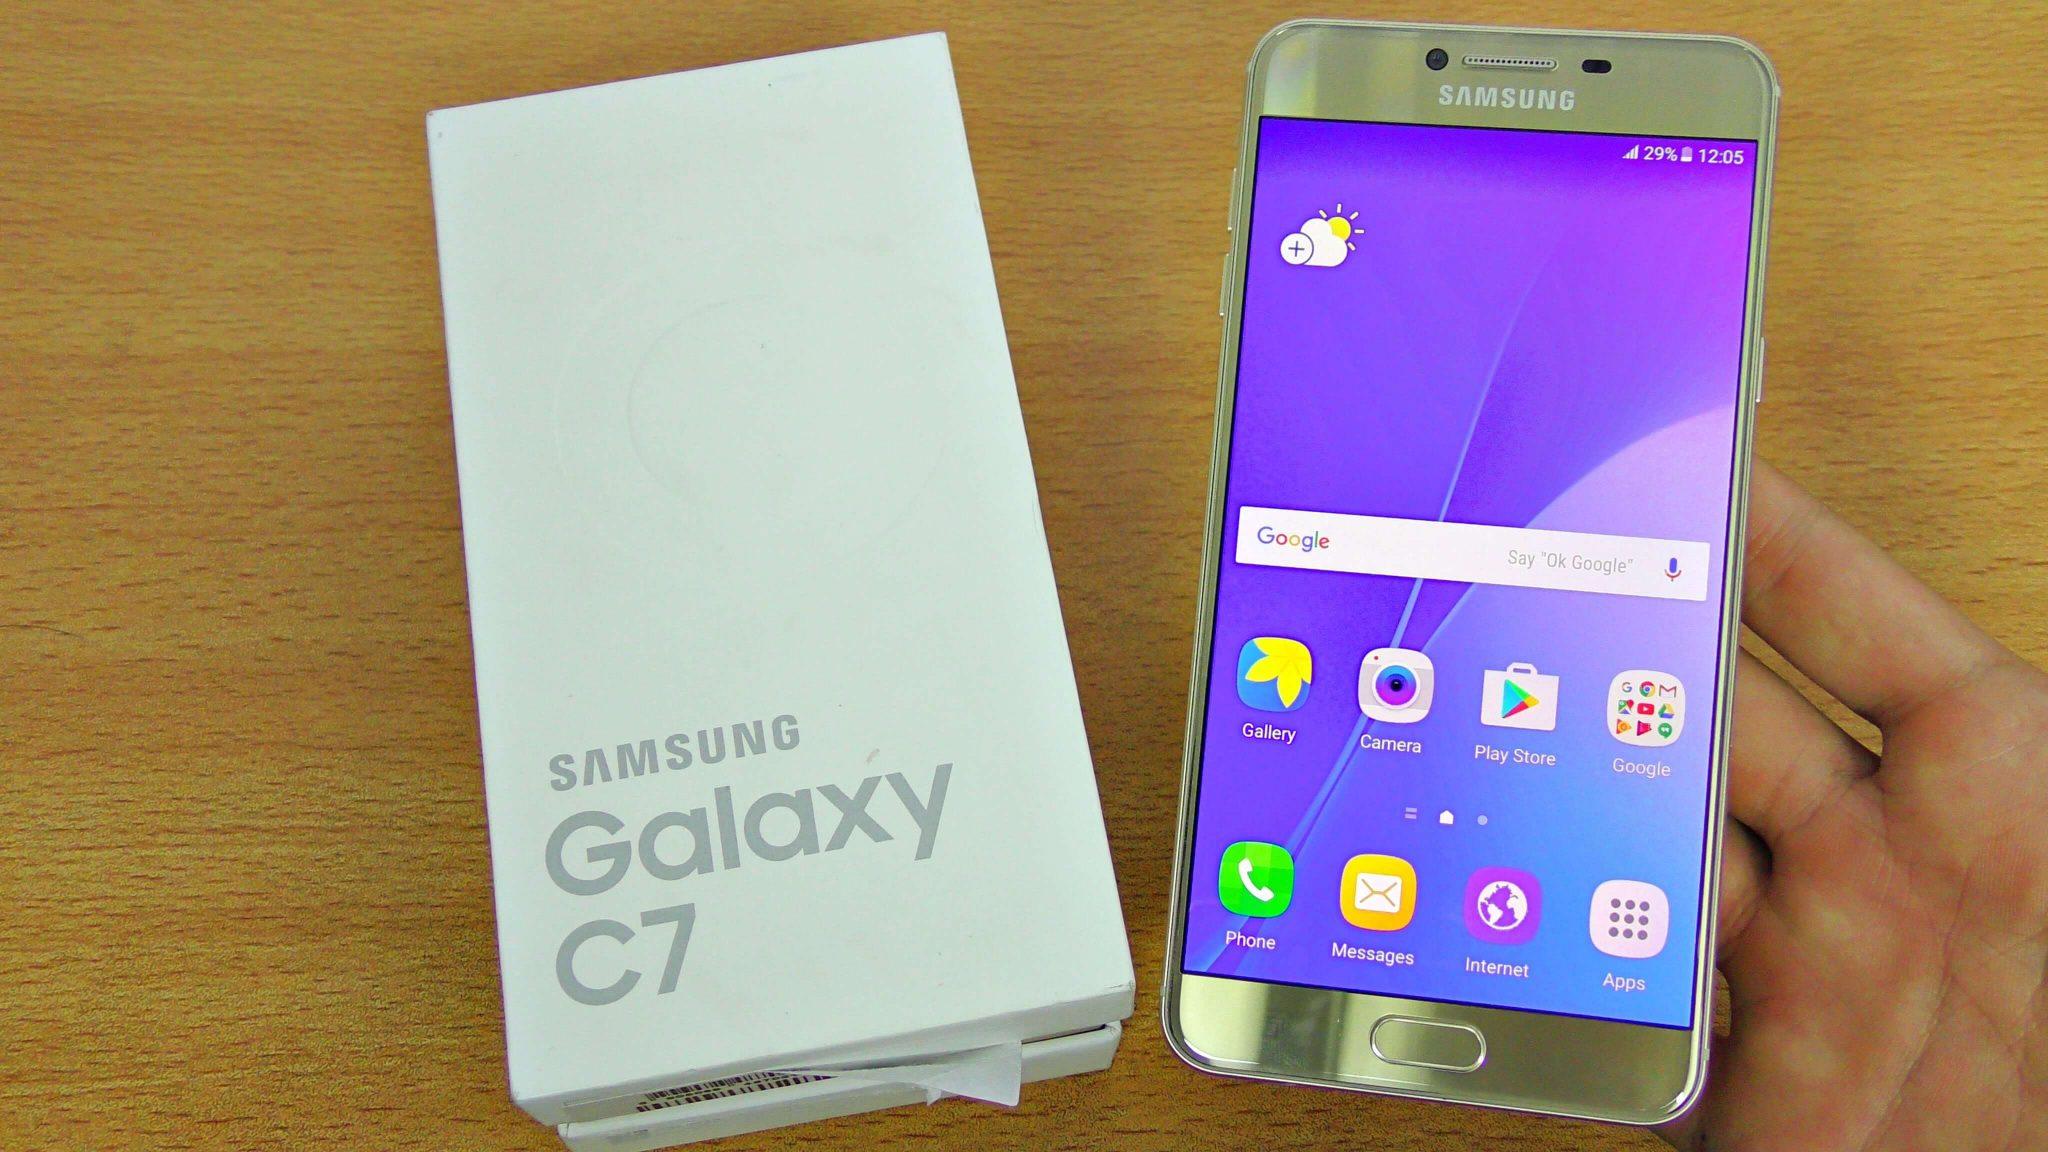 Samsung India, 2.5D Gorilla Glass, Samsung Galaxy C7 Pro, 4GB RAM.